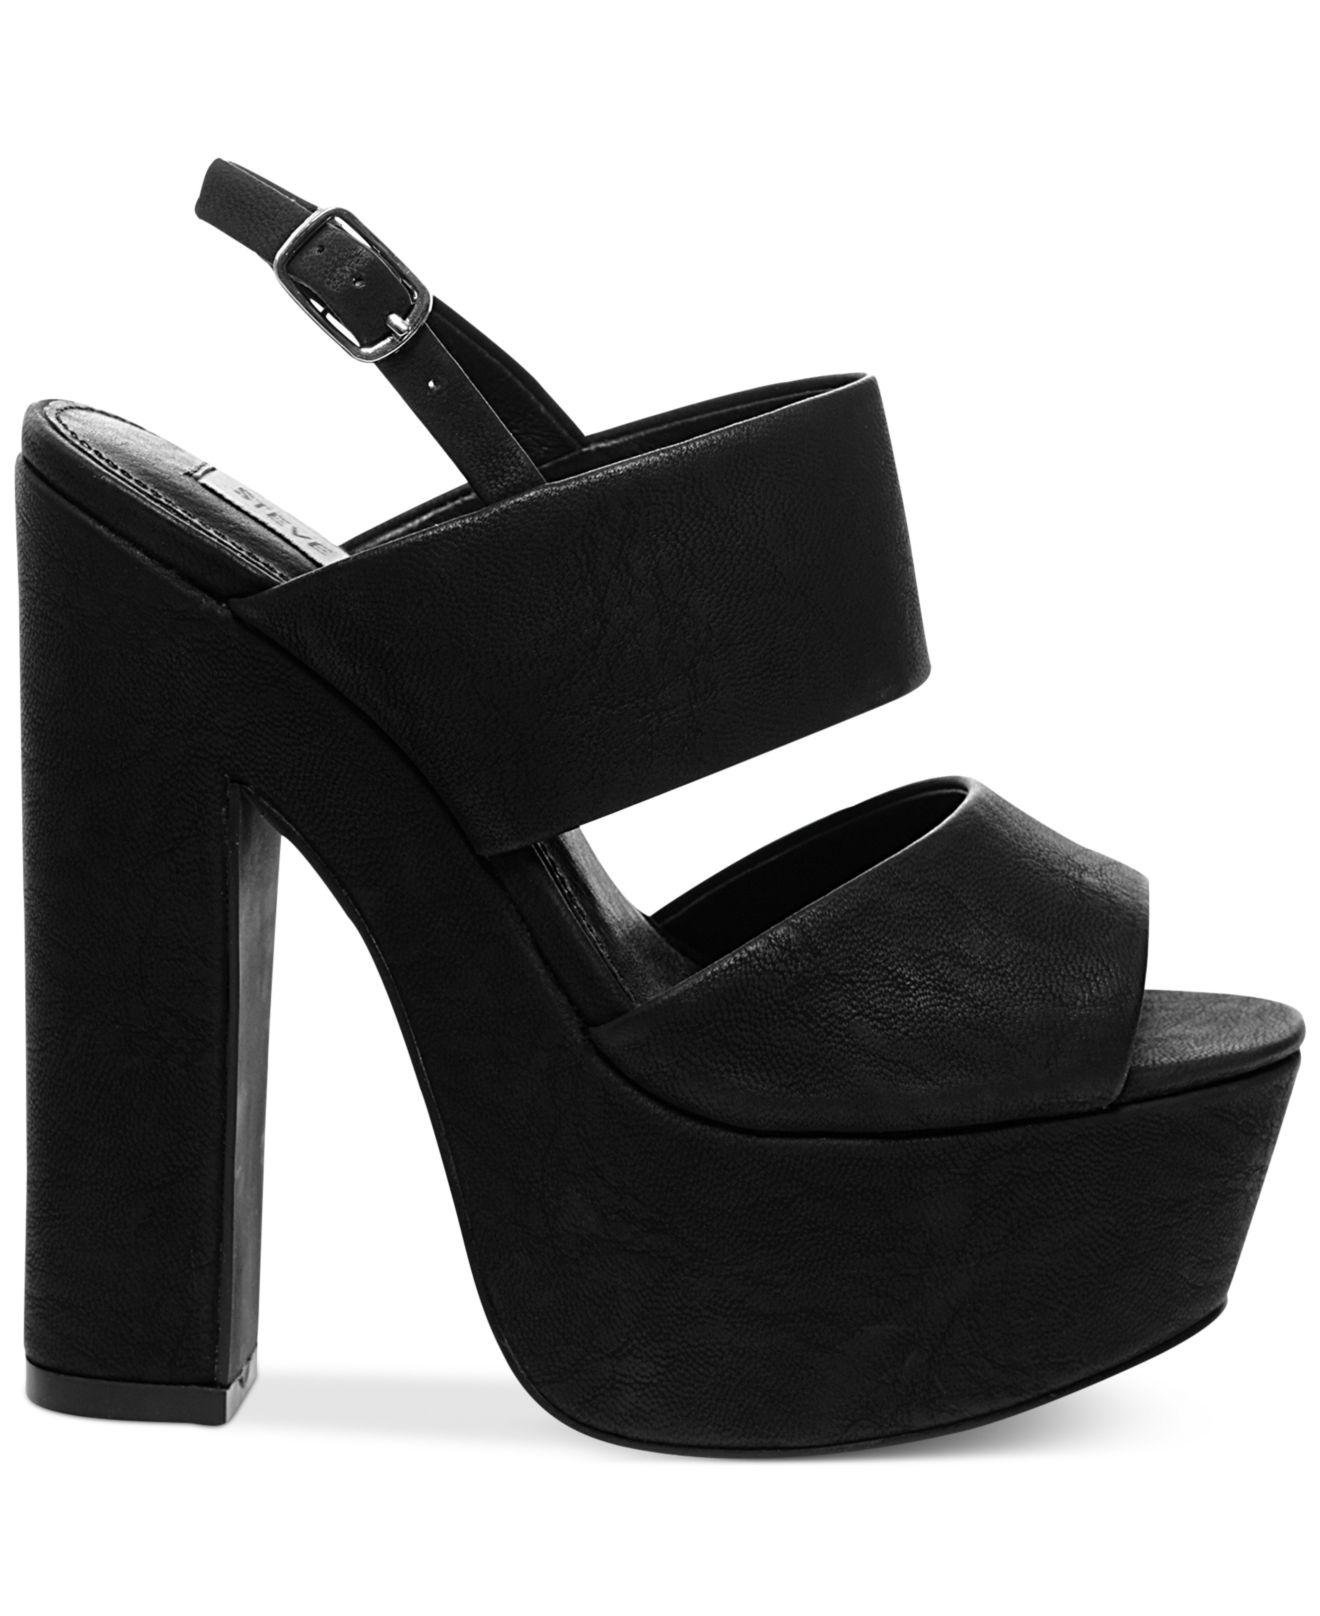 9cc86d1ce7a Lyst - Steve Madden Women s Wellthy Slingback Platform Sandals in Black